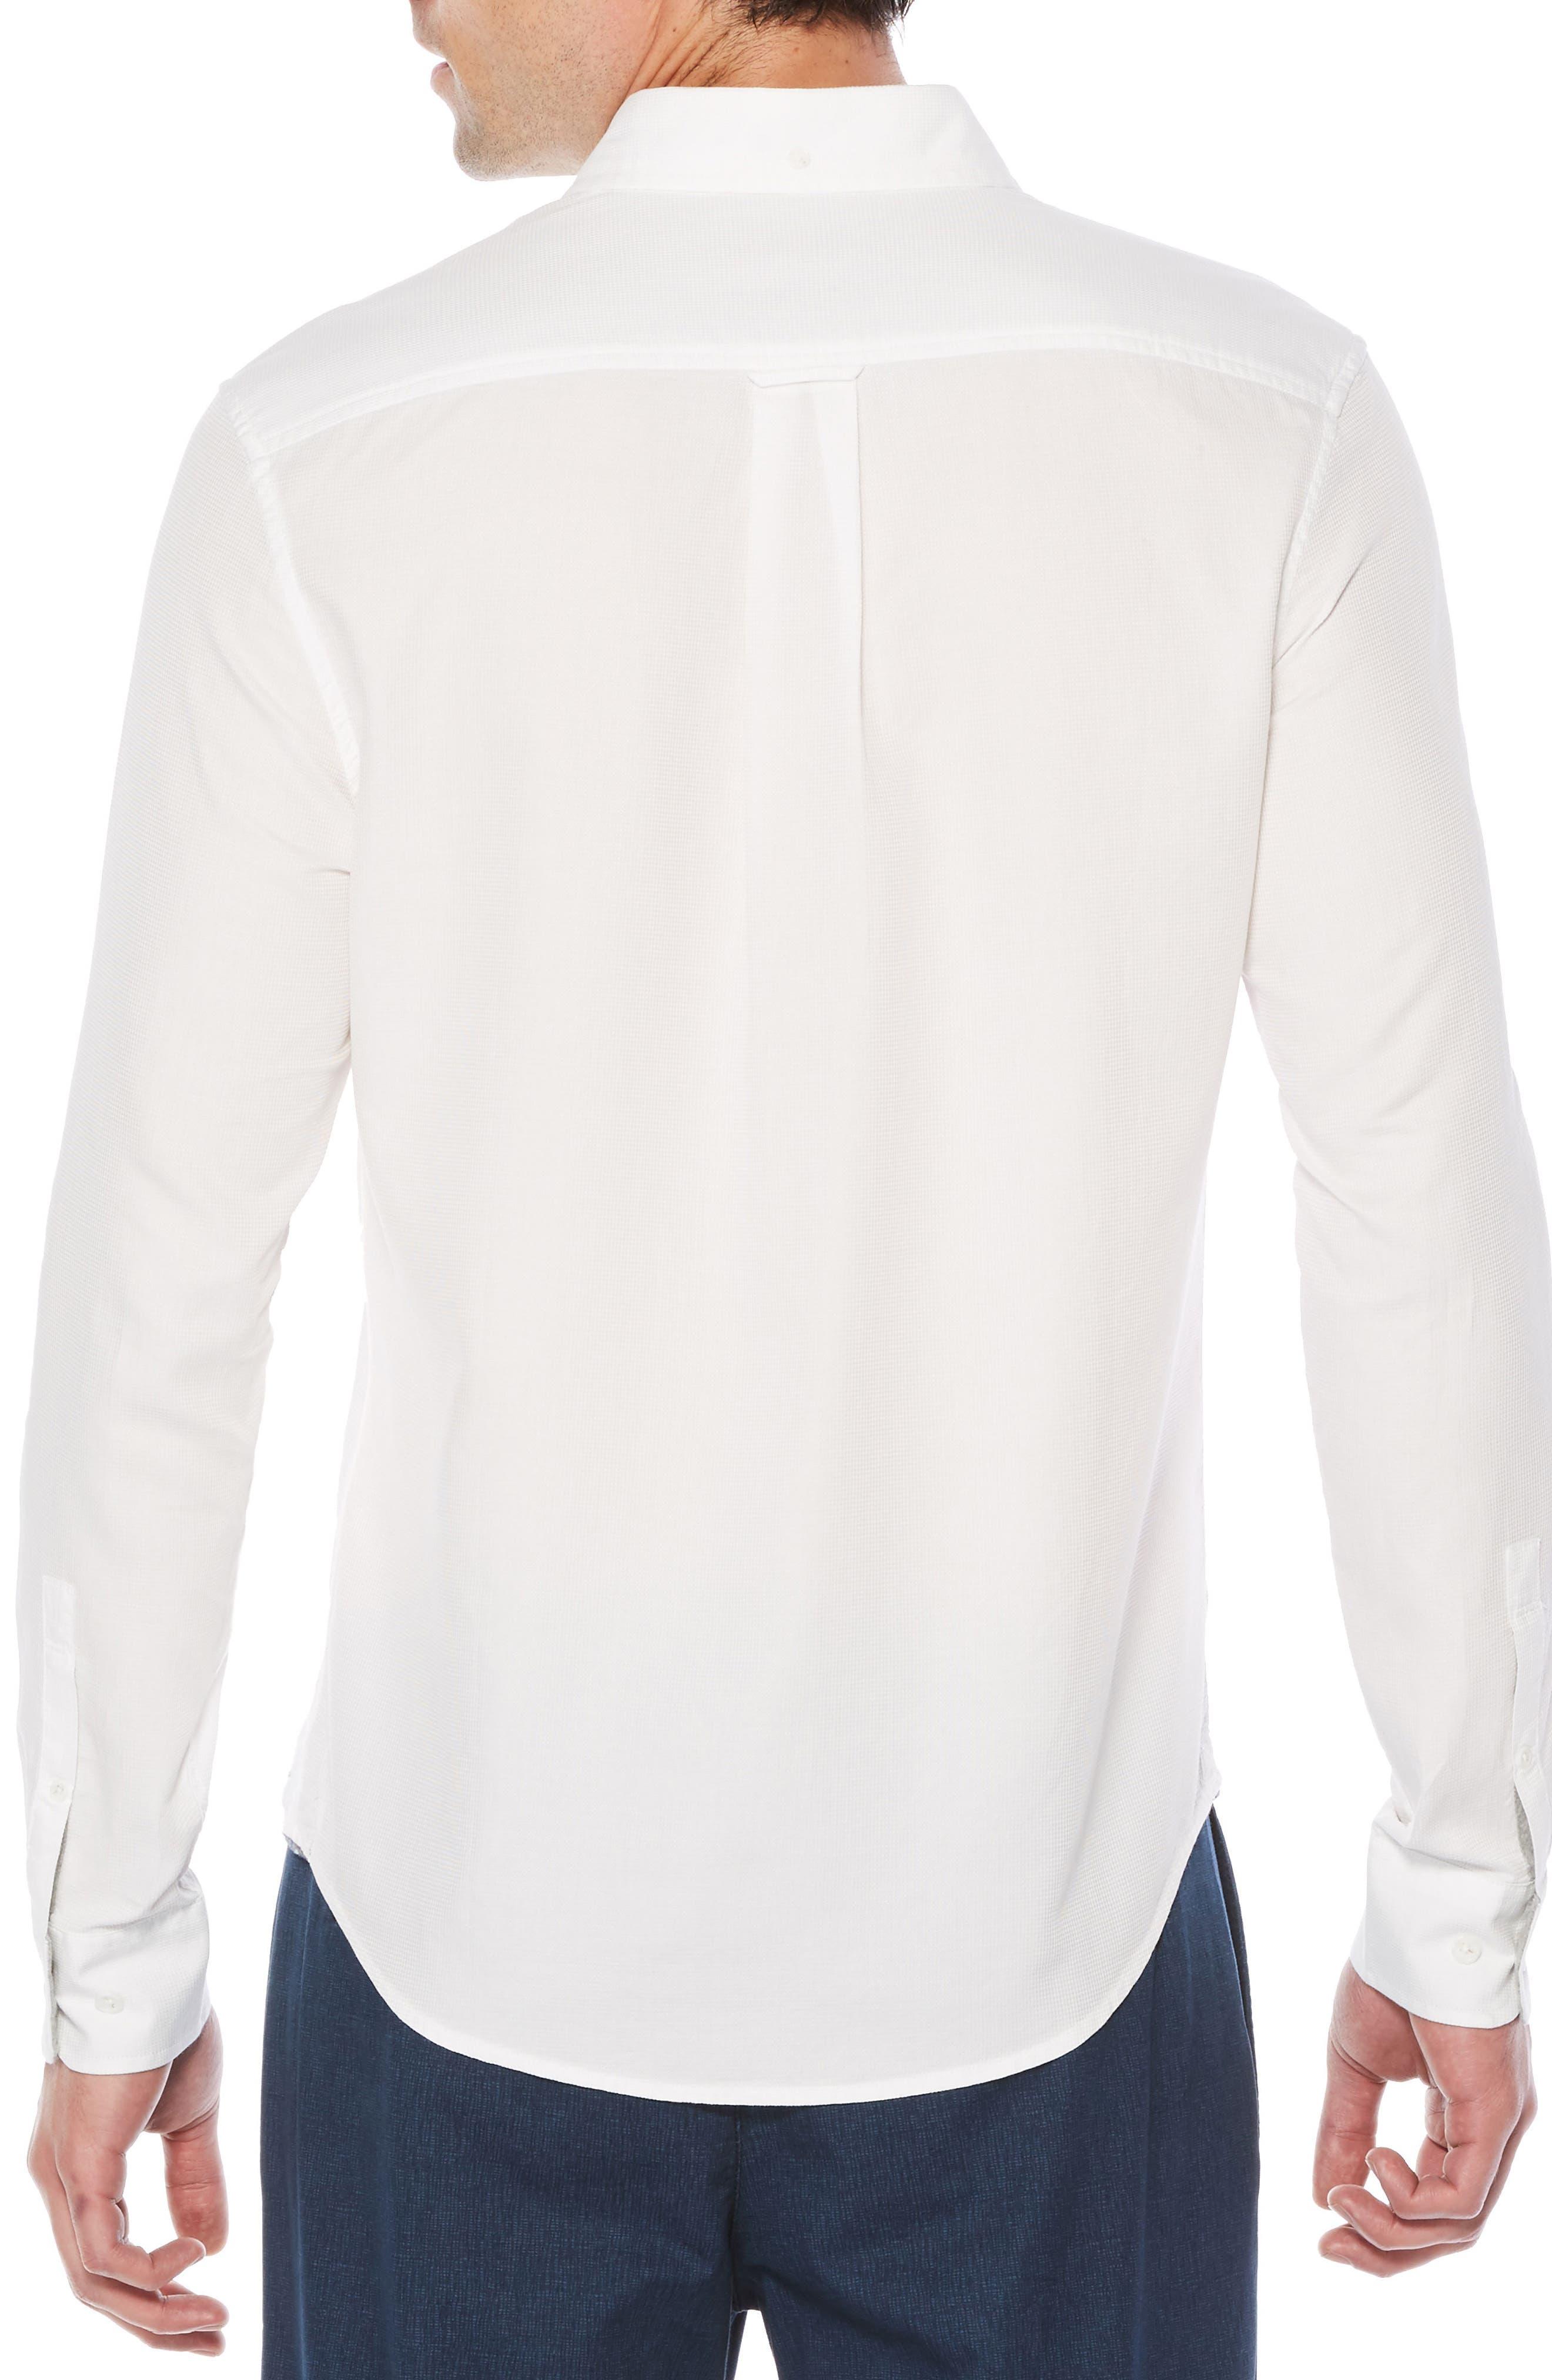 Alternate Image 2  - Original Penguin Woven Shirt